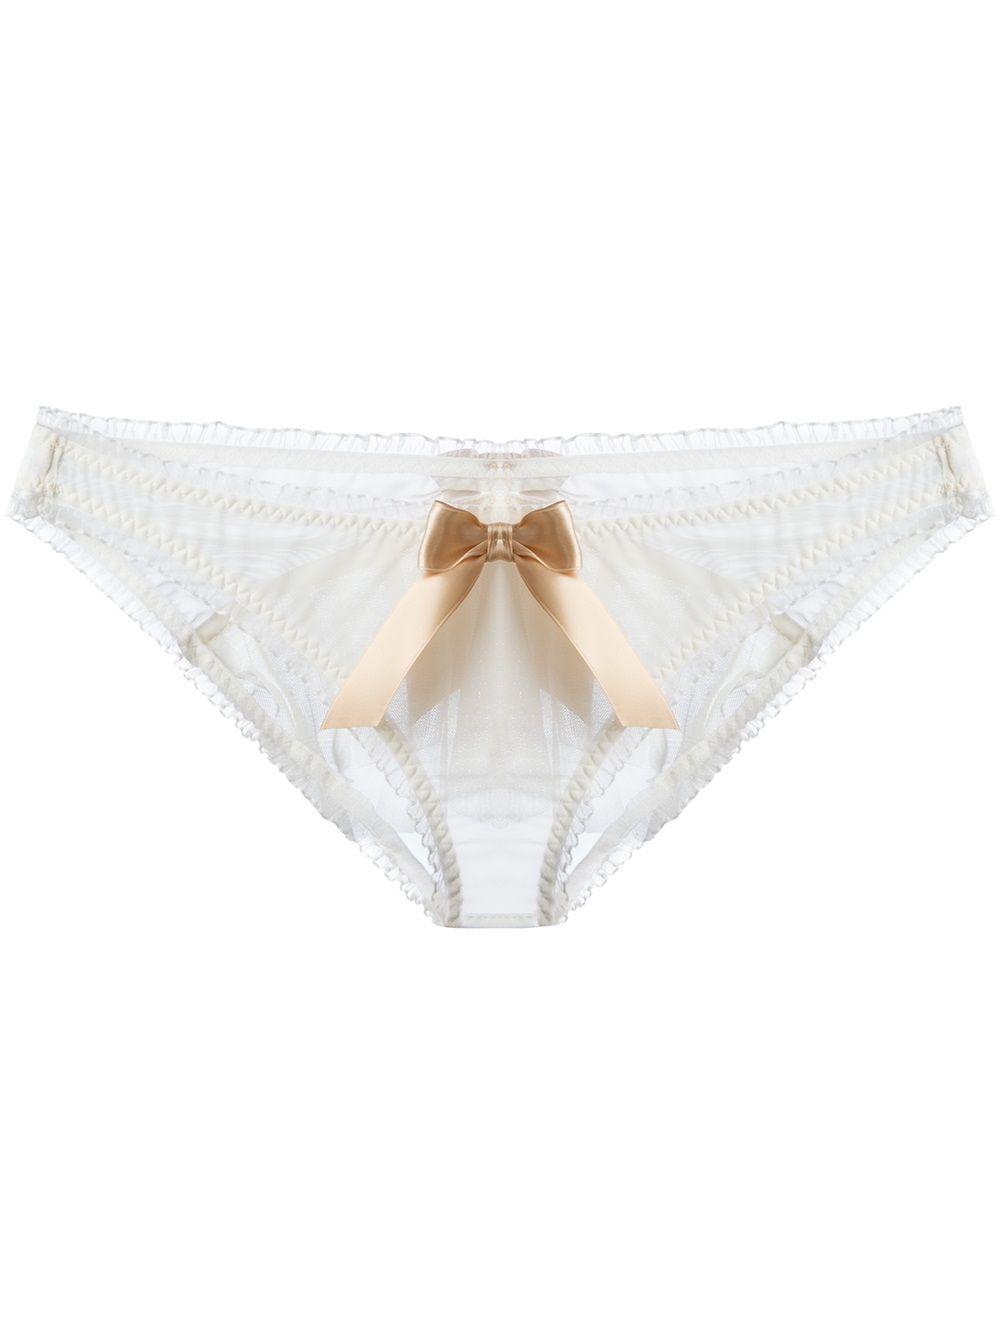 Undergarments for open back wedding dress  Lascivious ukittyu Brief  Dolci Follie  Farfetch